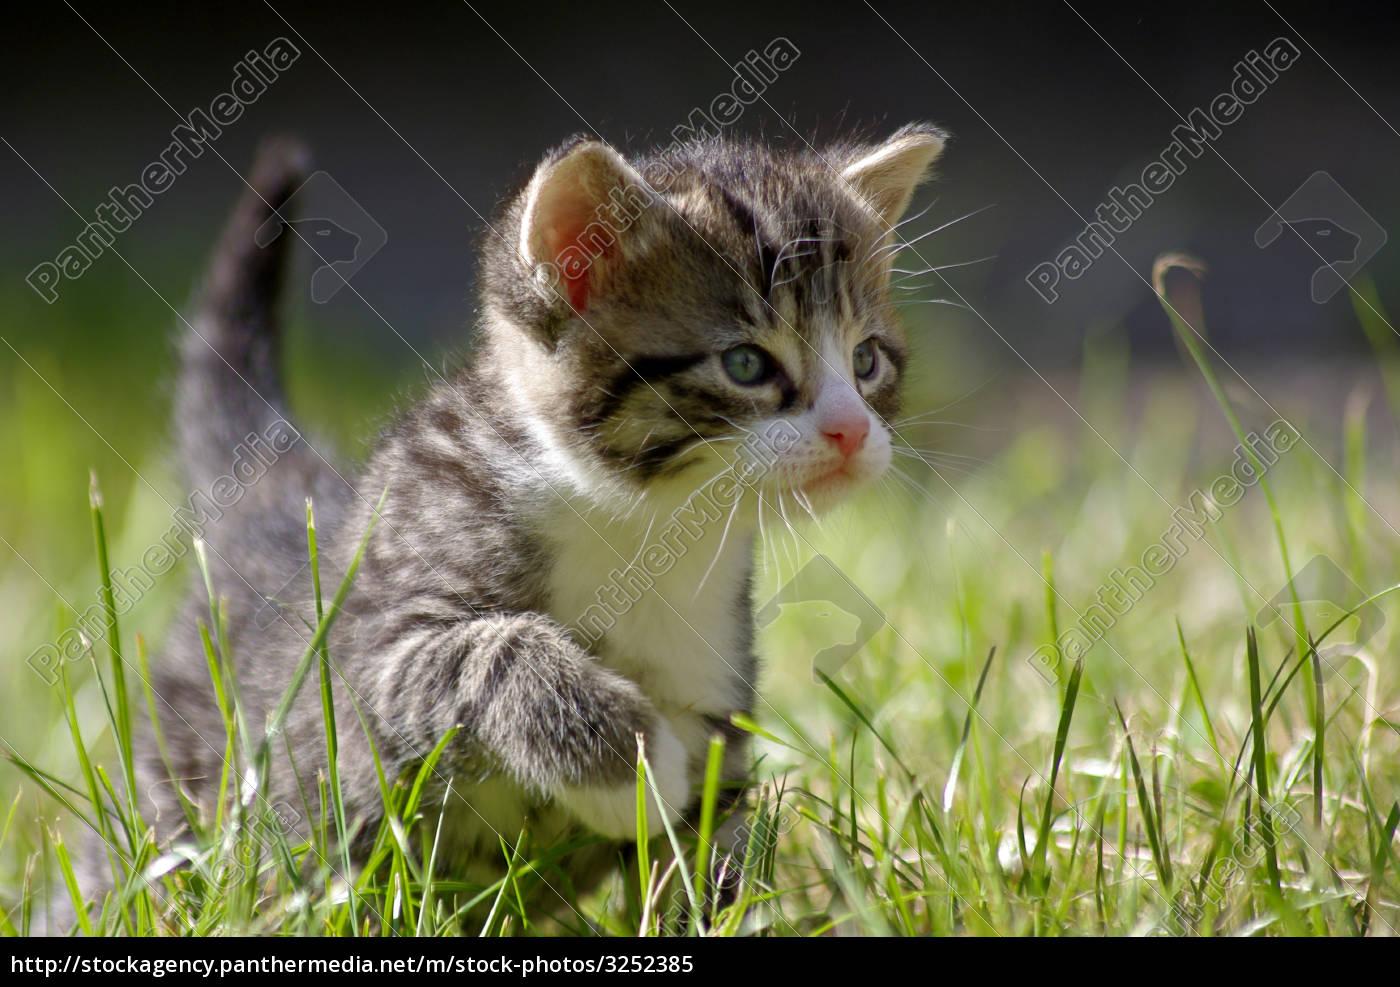 animals, pets, pussycat, cat, domestic cat, babykatze - 3252385